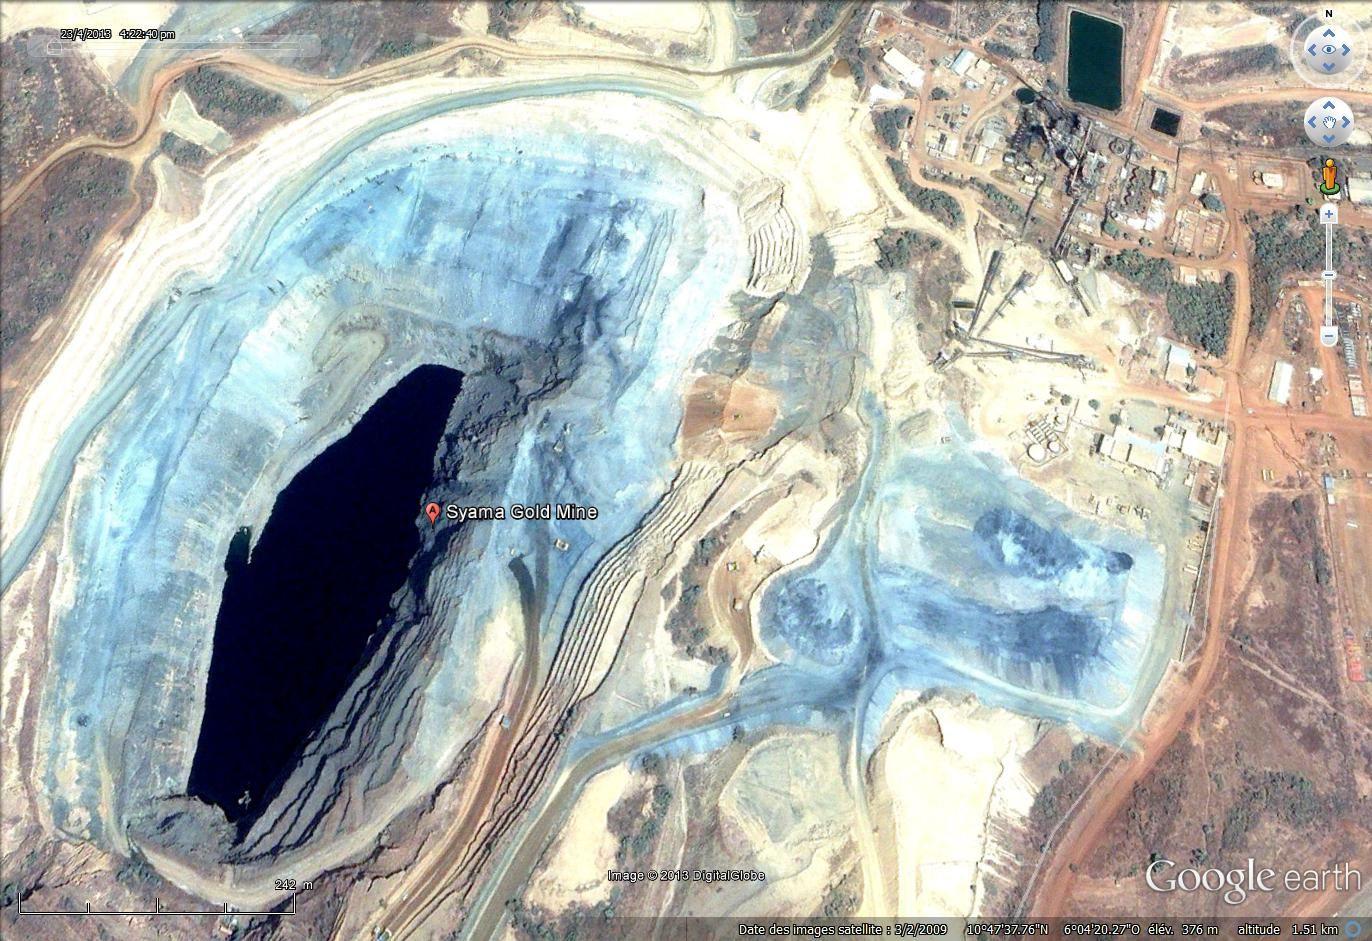 La mine, Google earth 2009